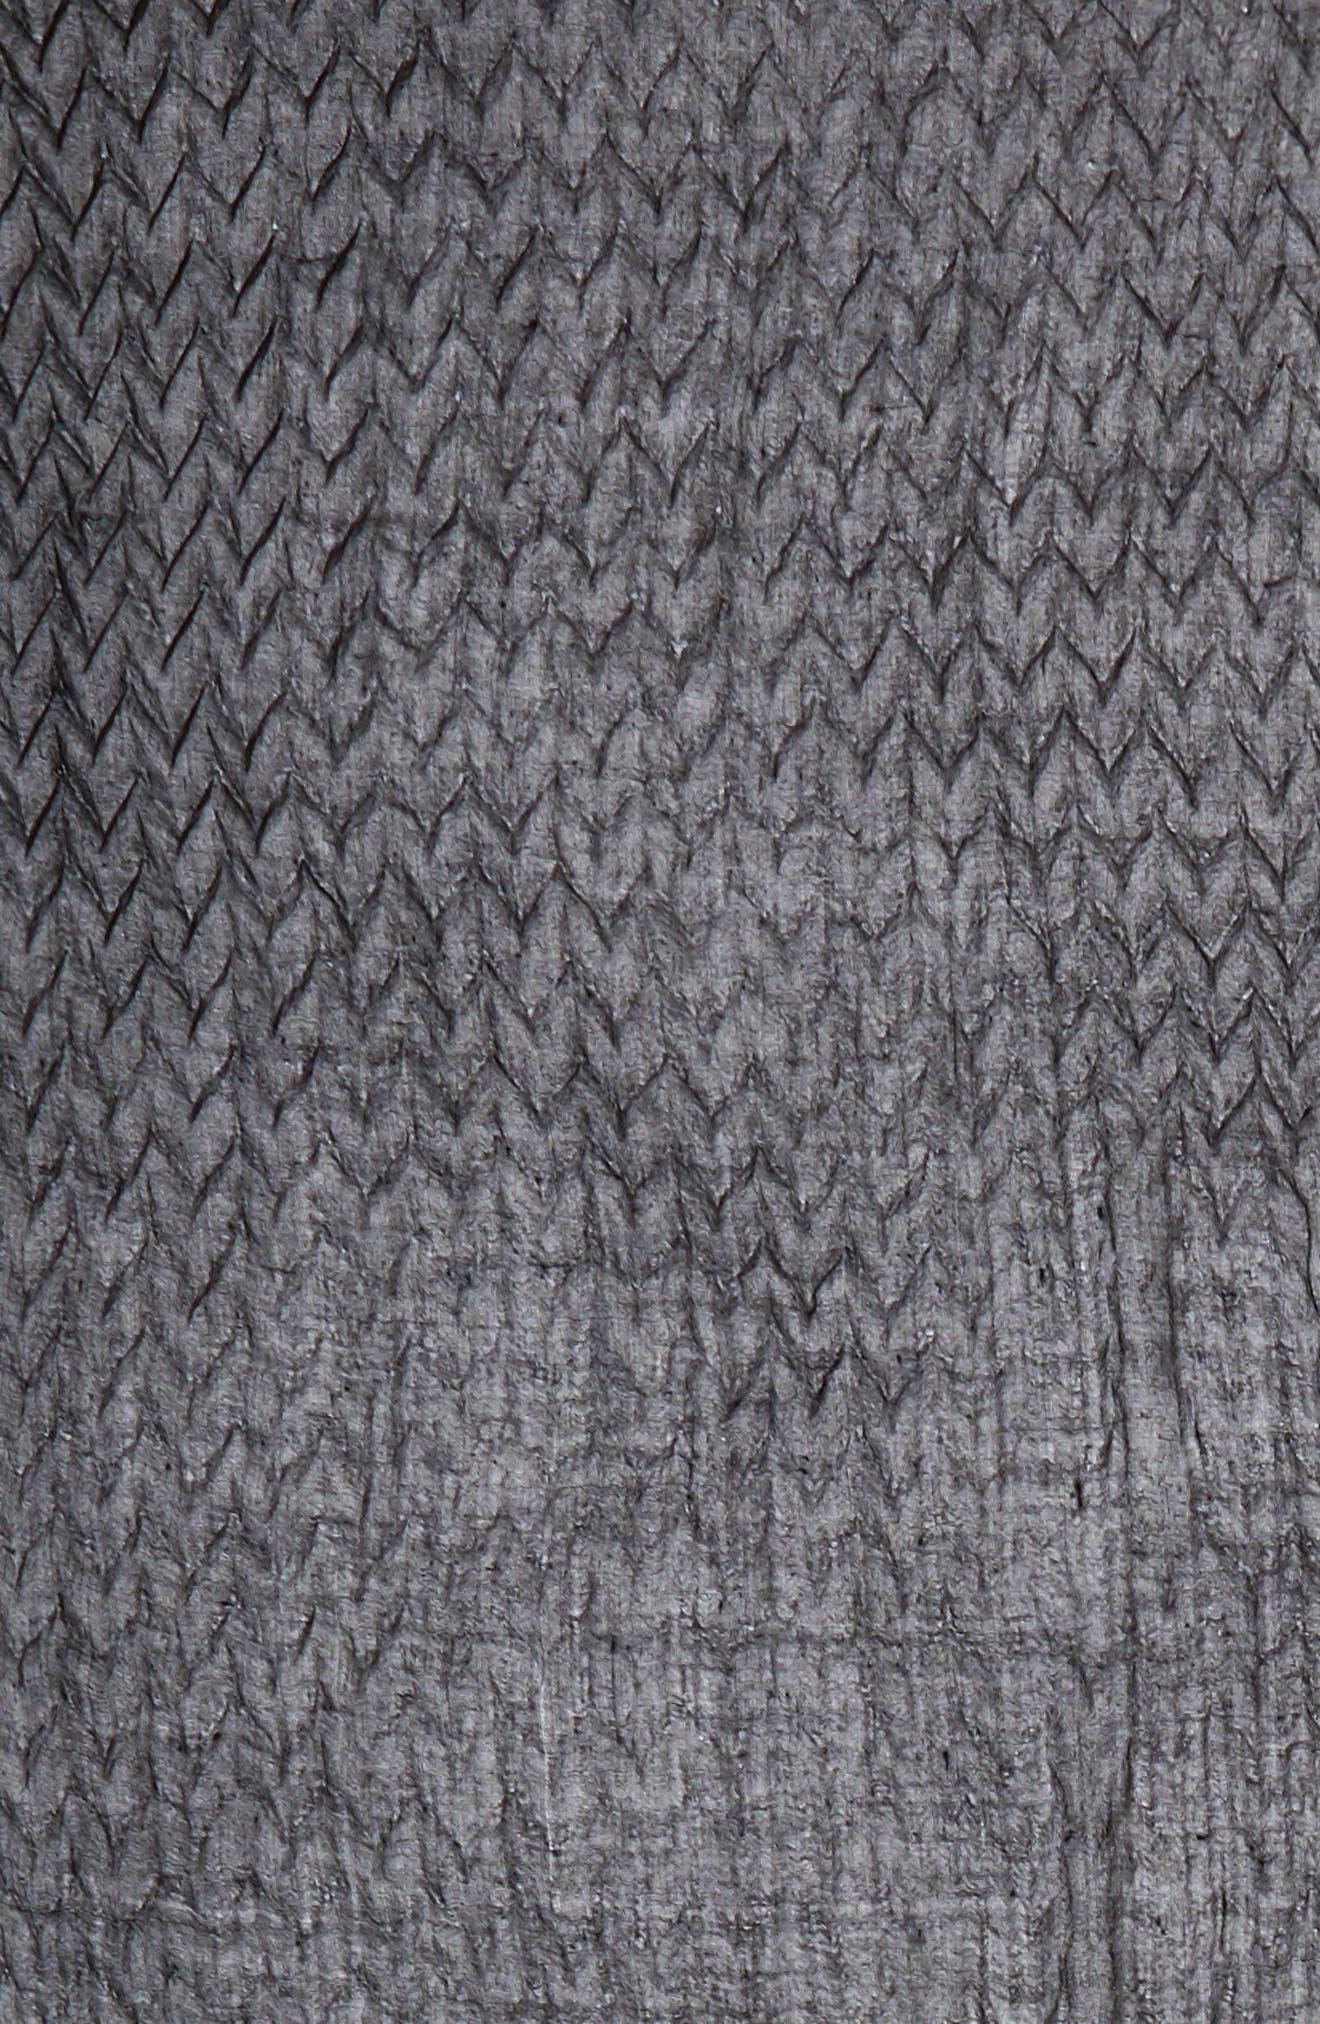 Silk & Wool Wrap,                             Alternate thumbnail 4, color,                             001